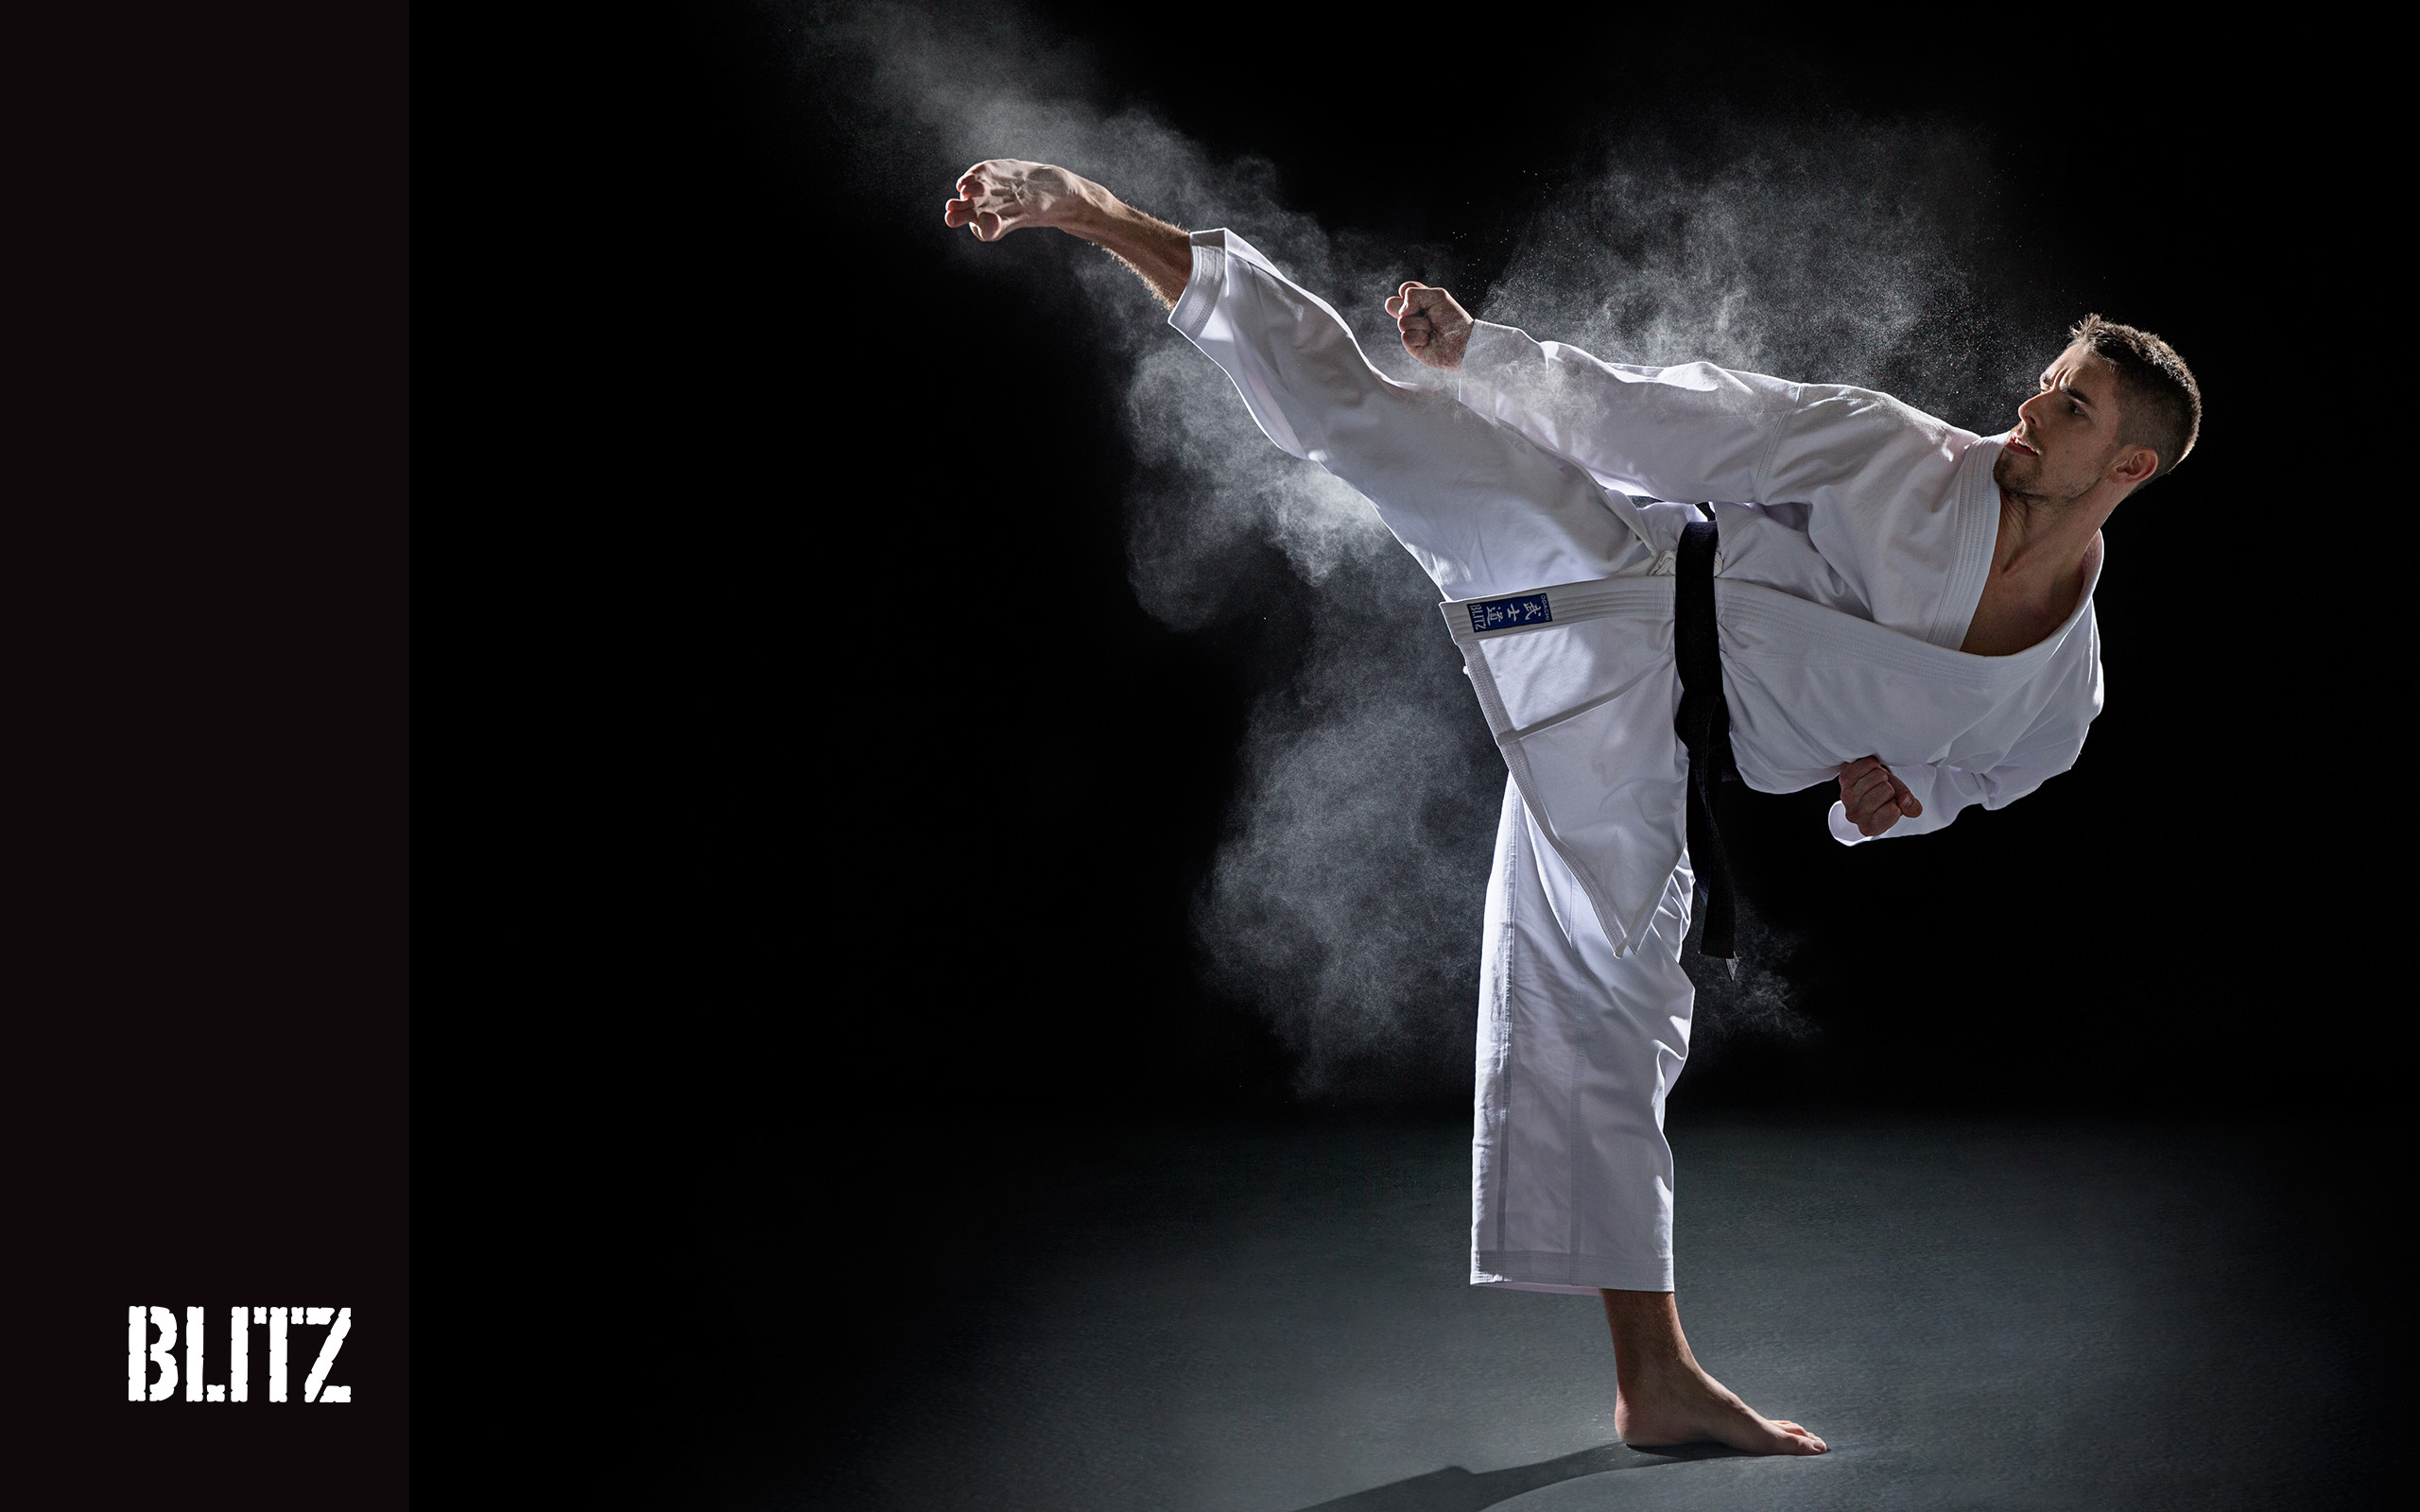 Raiders Wallpaper Hd Aikido Wallpaper 63 Images